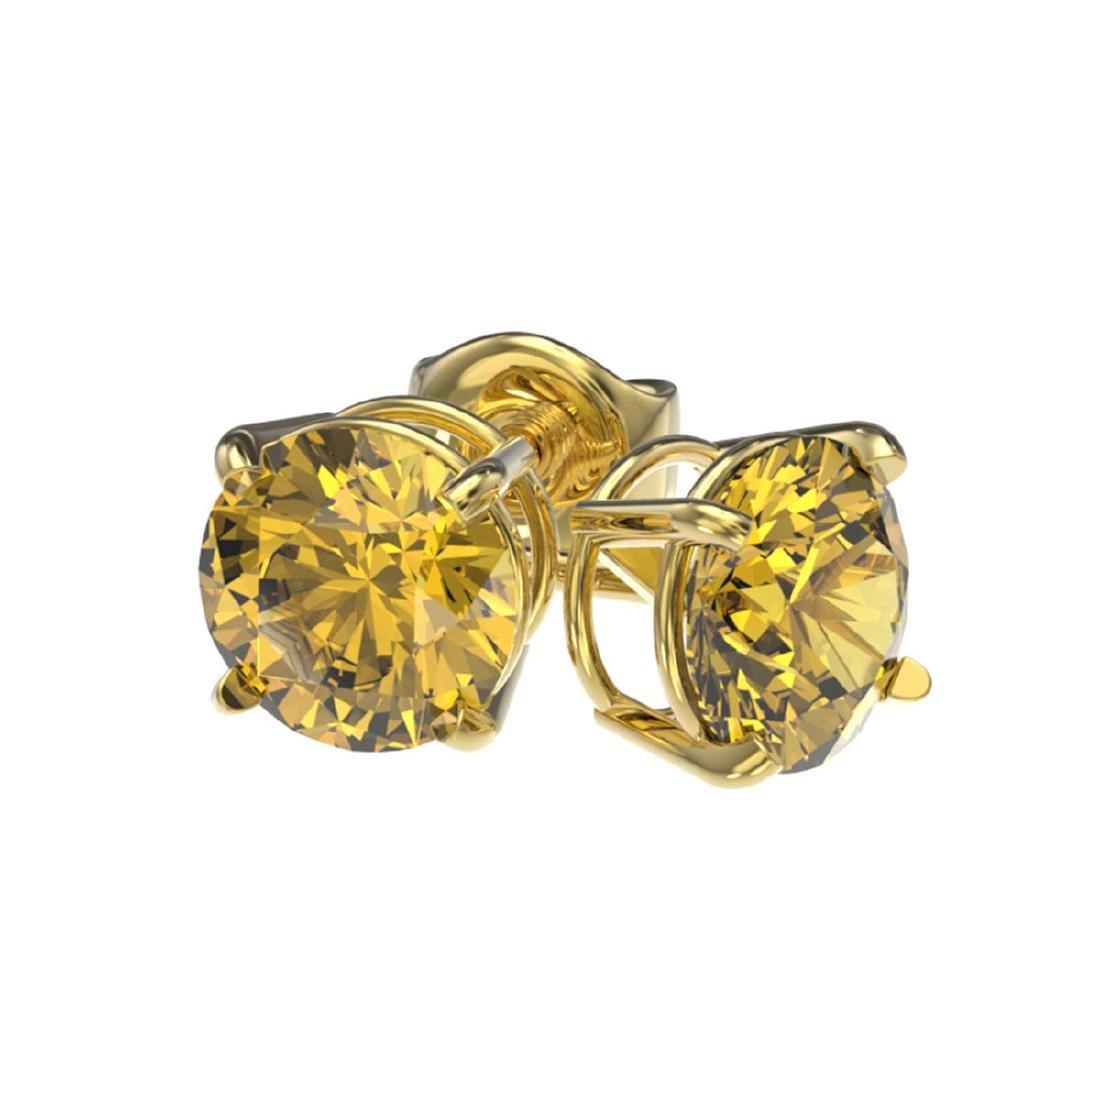 1 ctw Intense Yellow Diamond Stud Earrings 10K Yellow - 3